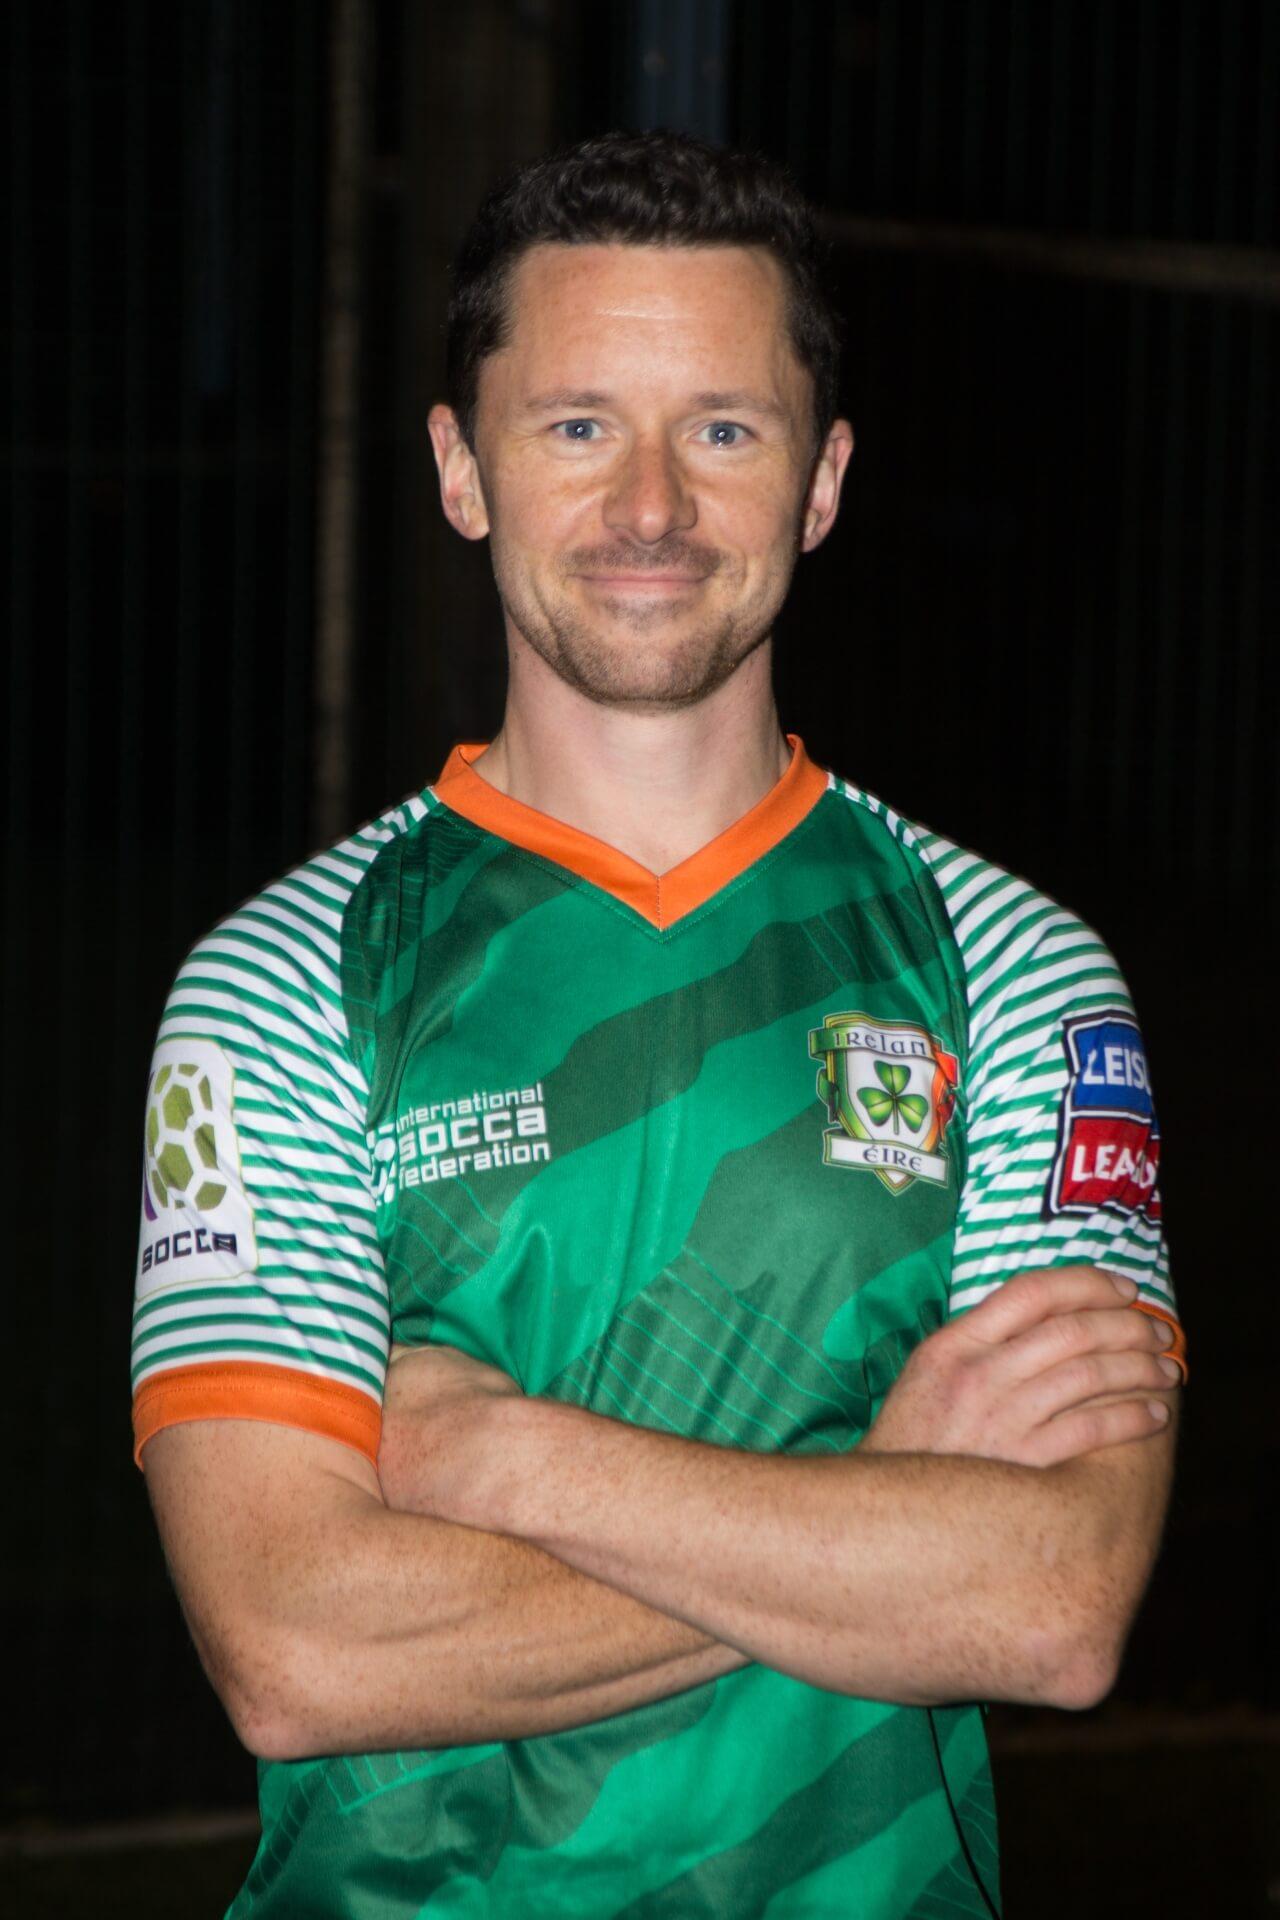 Jamesie Moriarty